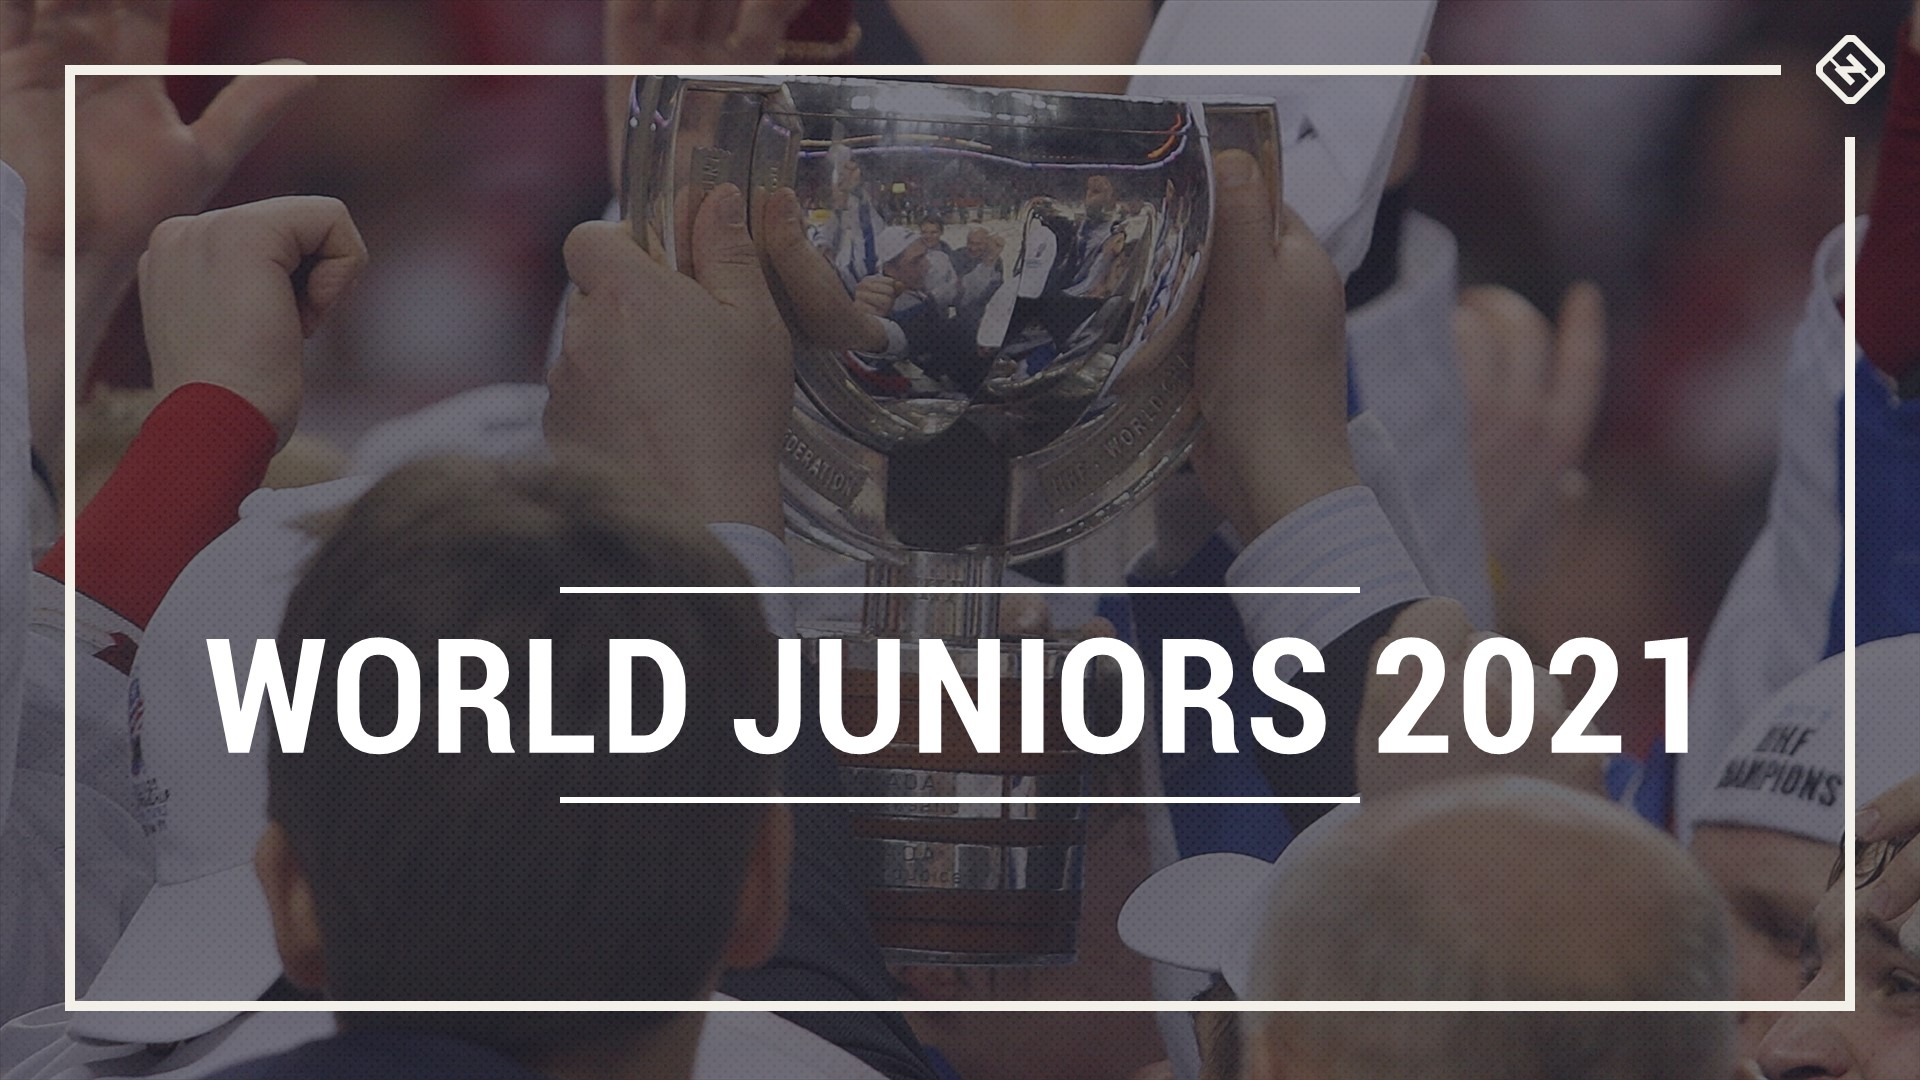 World Juniors 2021: Time, TV channel, live stream, where, when, schedule